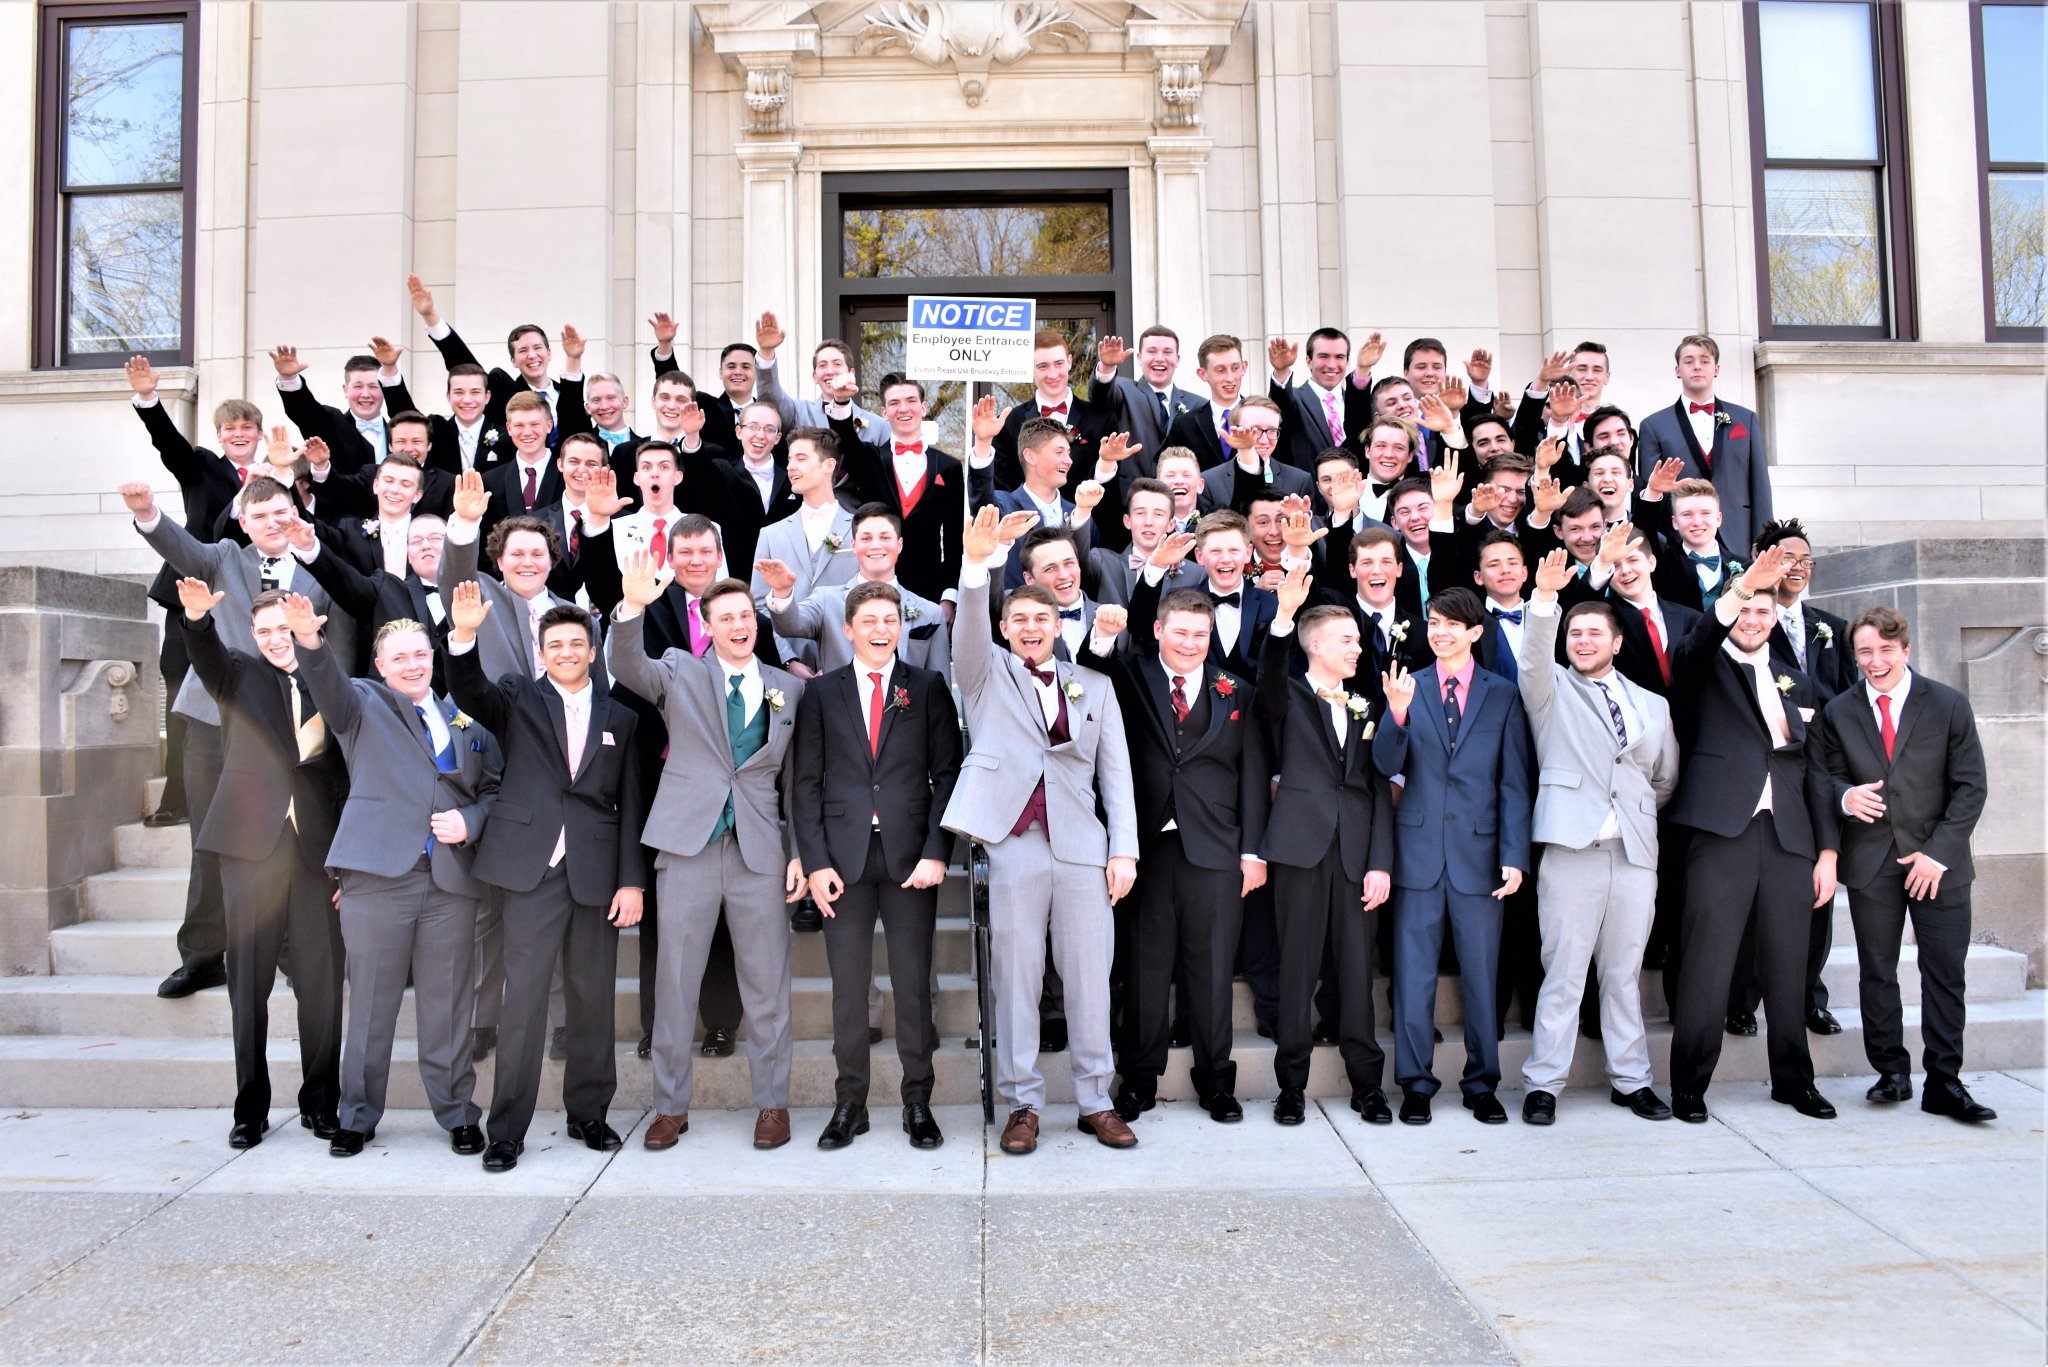 nazi salute prom photo full